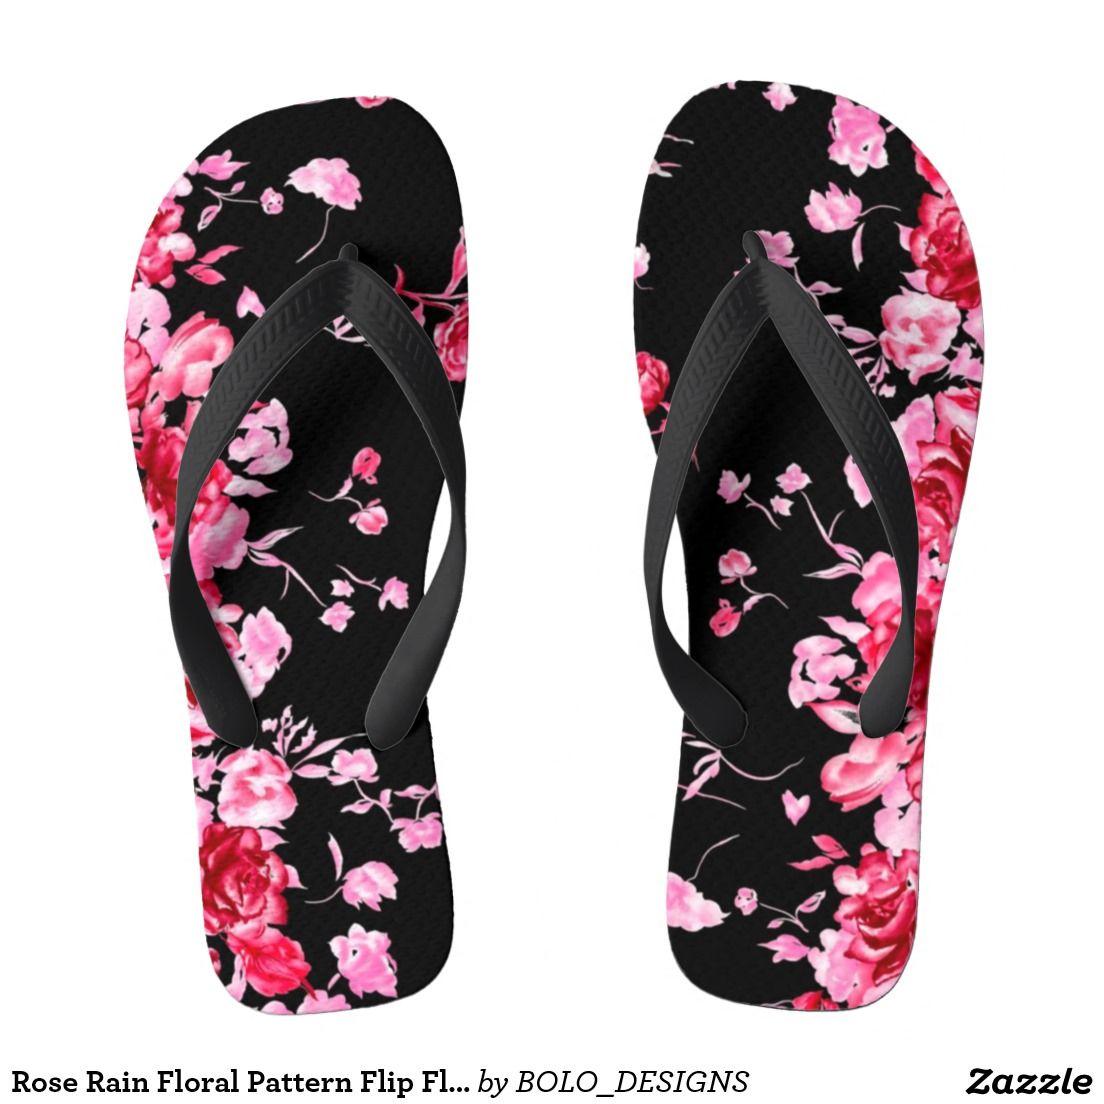 0b6c32a5a3a08 Rose Rain Floral Pattern Flip Flops